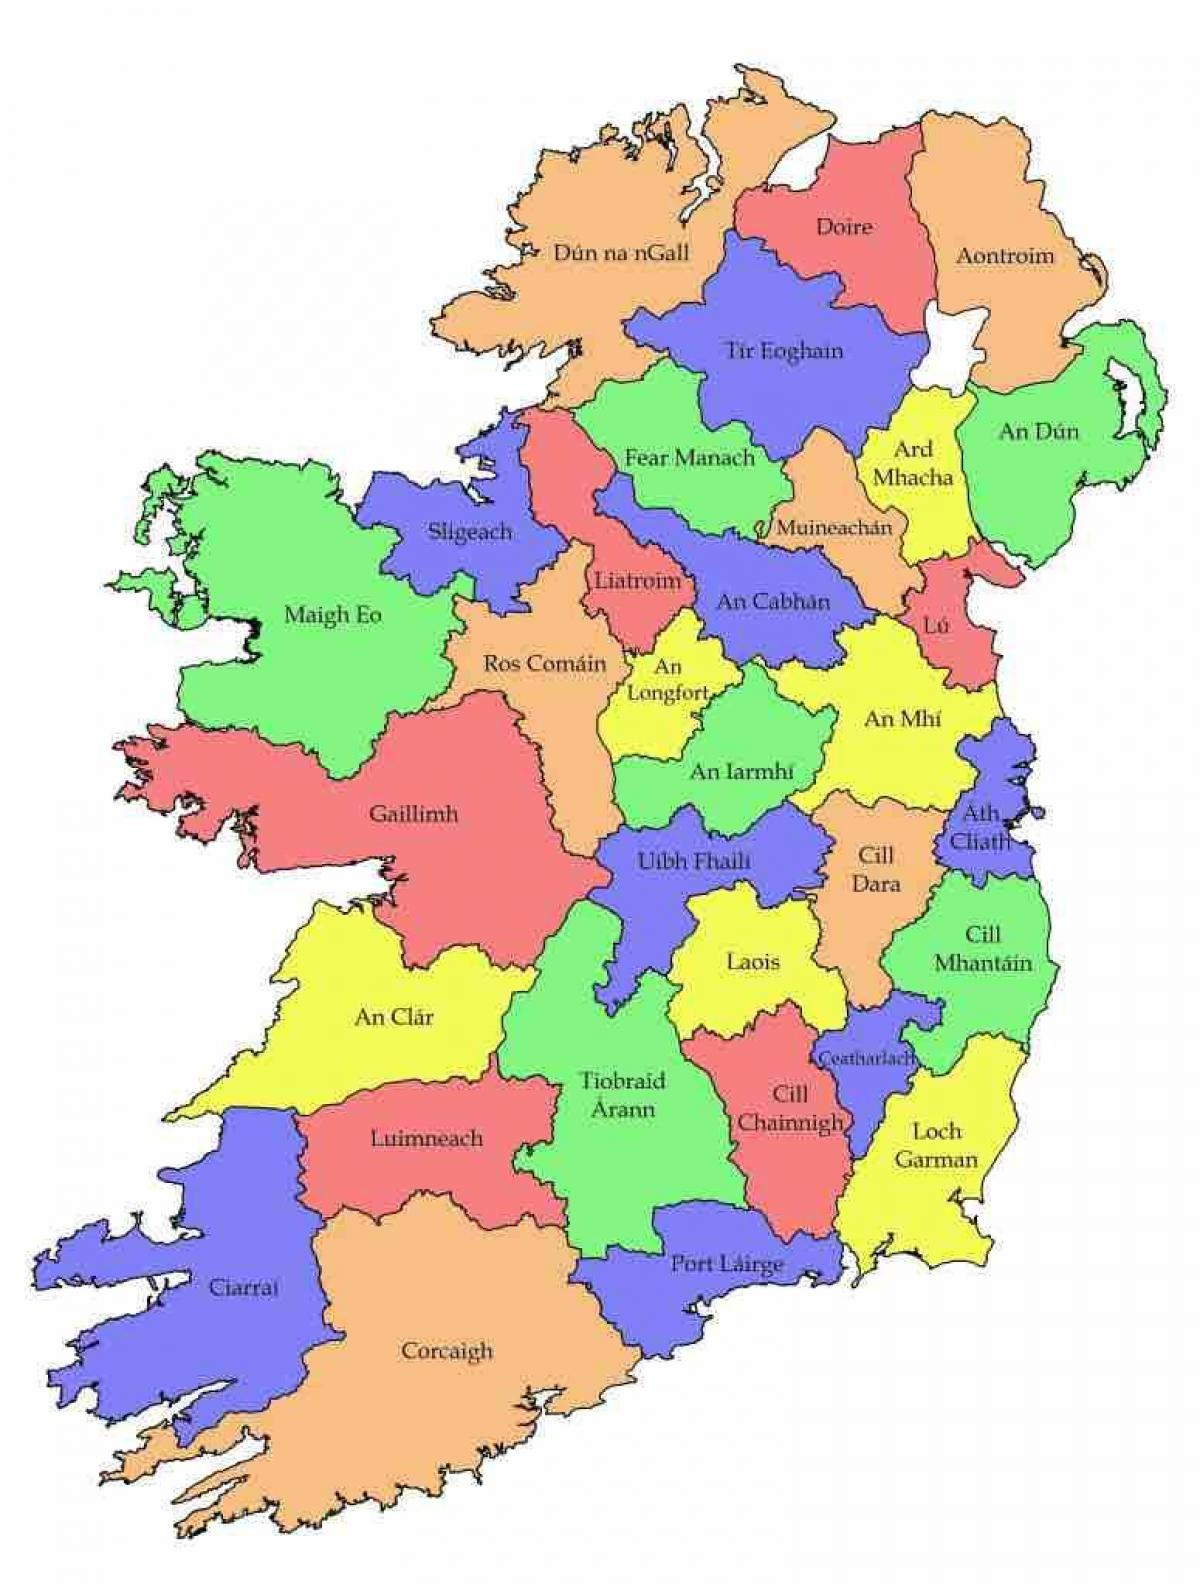 irland karte mit counties Beschriftete Karte von Irland   Karte von Irland mit county Namen